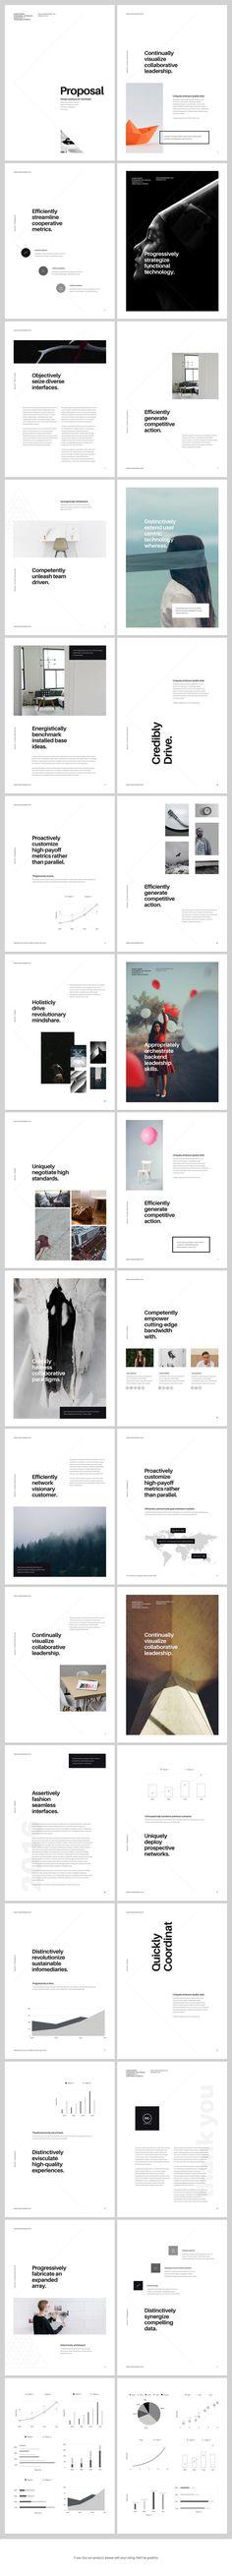 A4 Keynote Presentation for Print by GoaShape on @creativemarket: